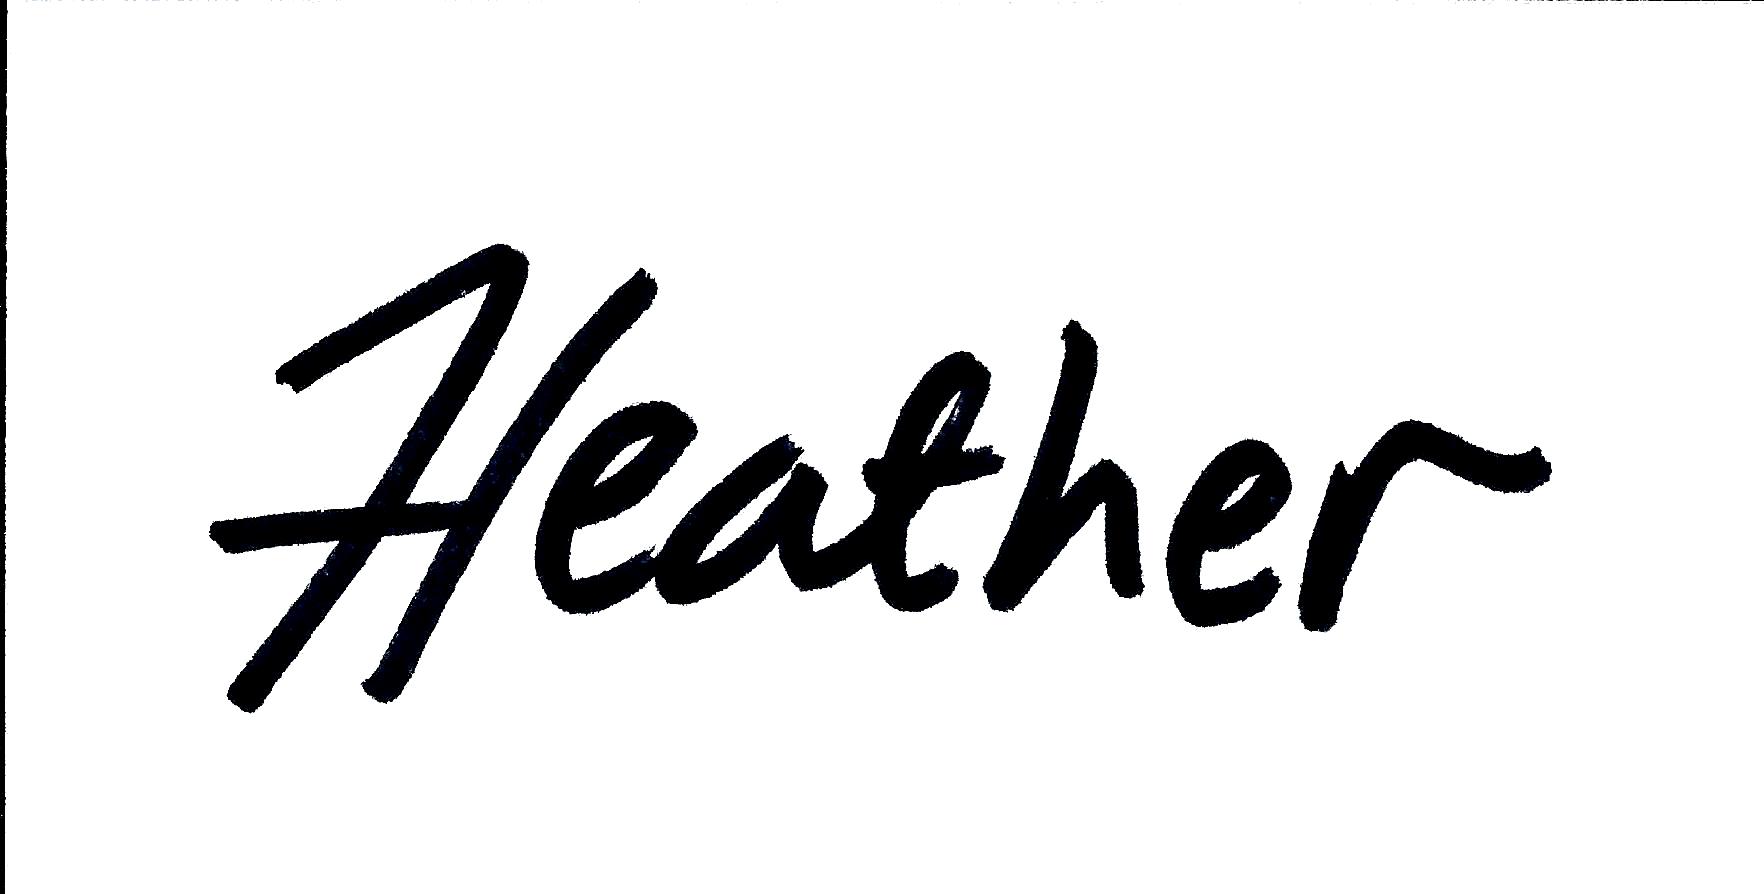 Heather Signed Name